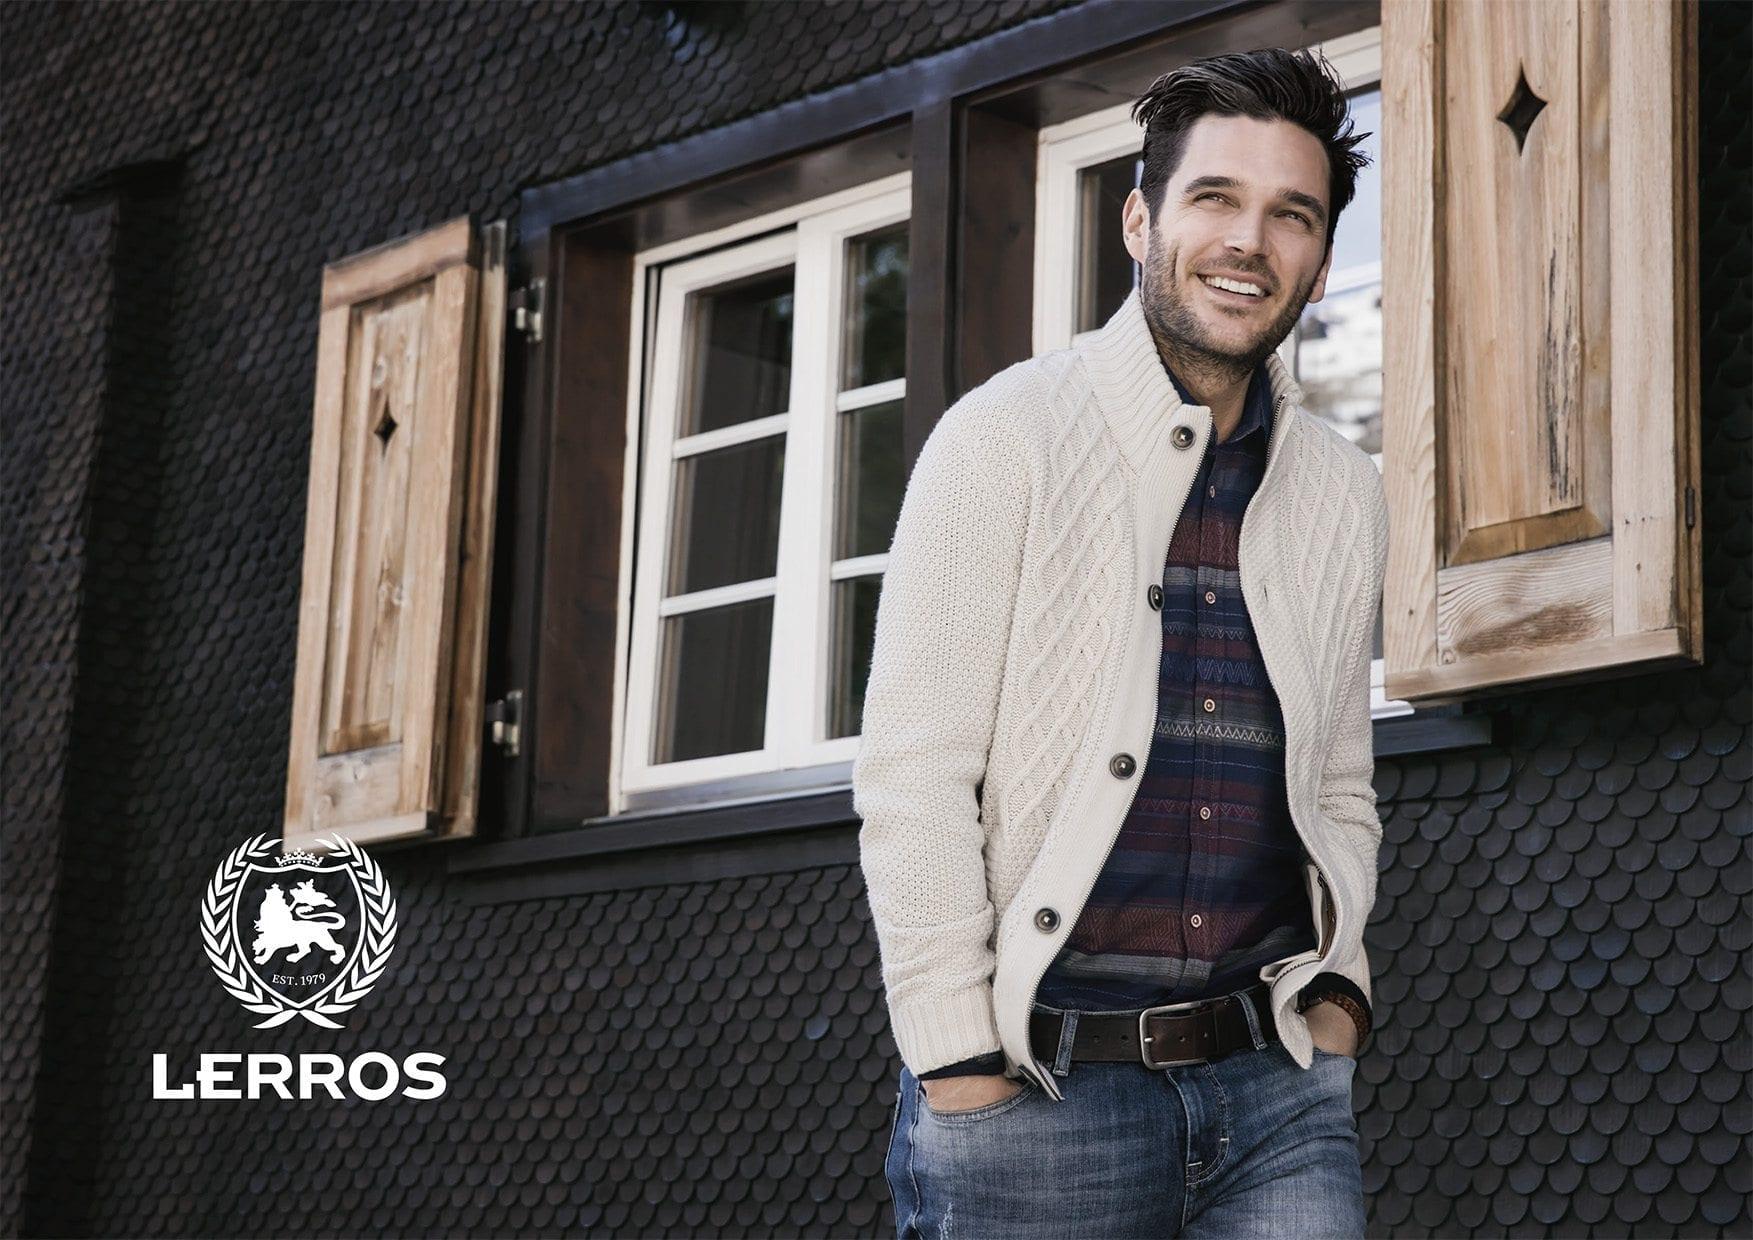 LERROS Online shop - Herrenmode - Herbst   Winter 2017 e722e7852d